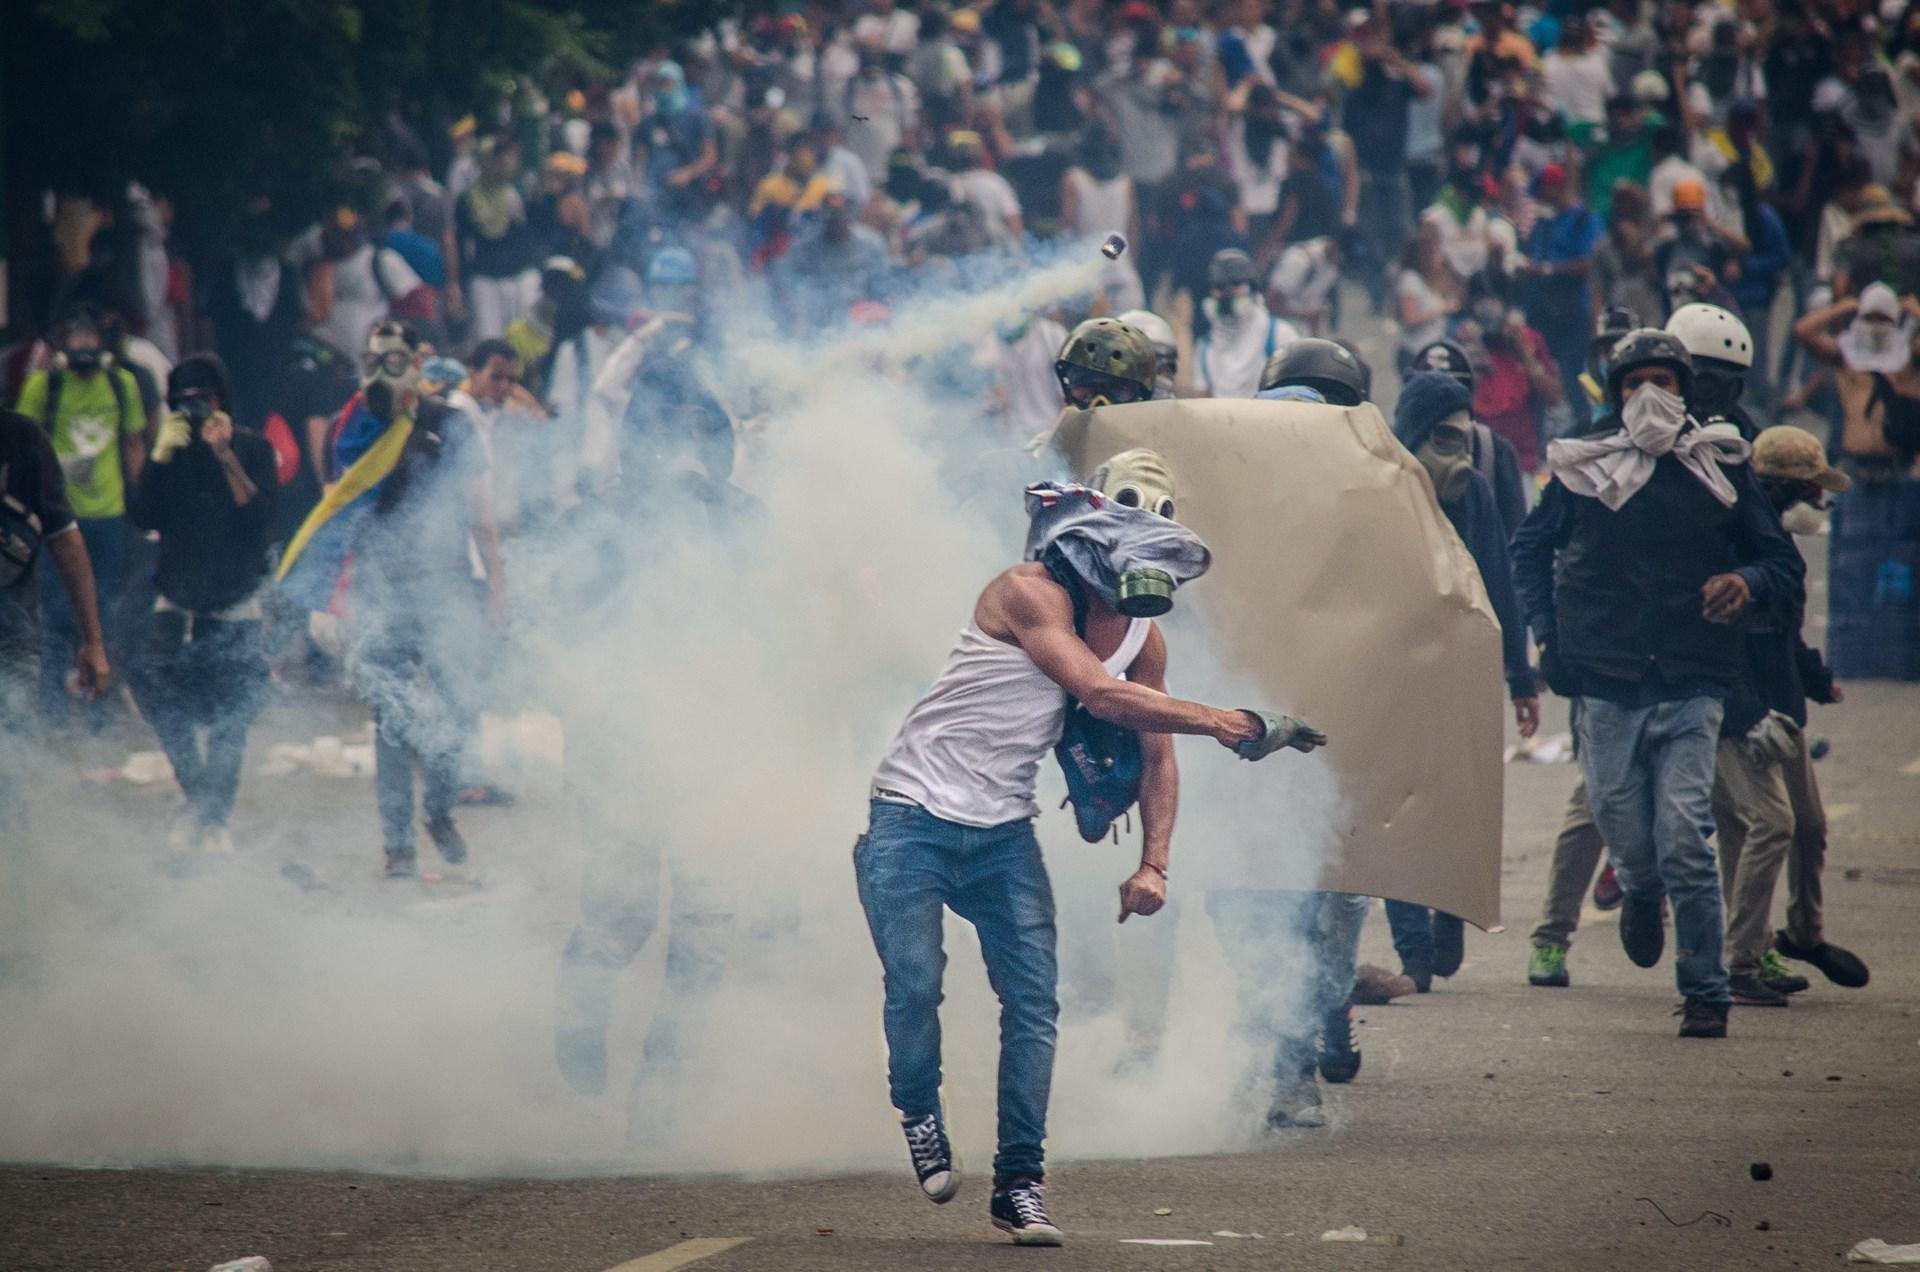 Venezuela's Economic Collapse Is Linked to Its Socialist Policies